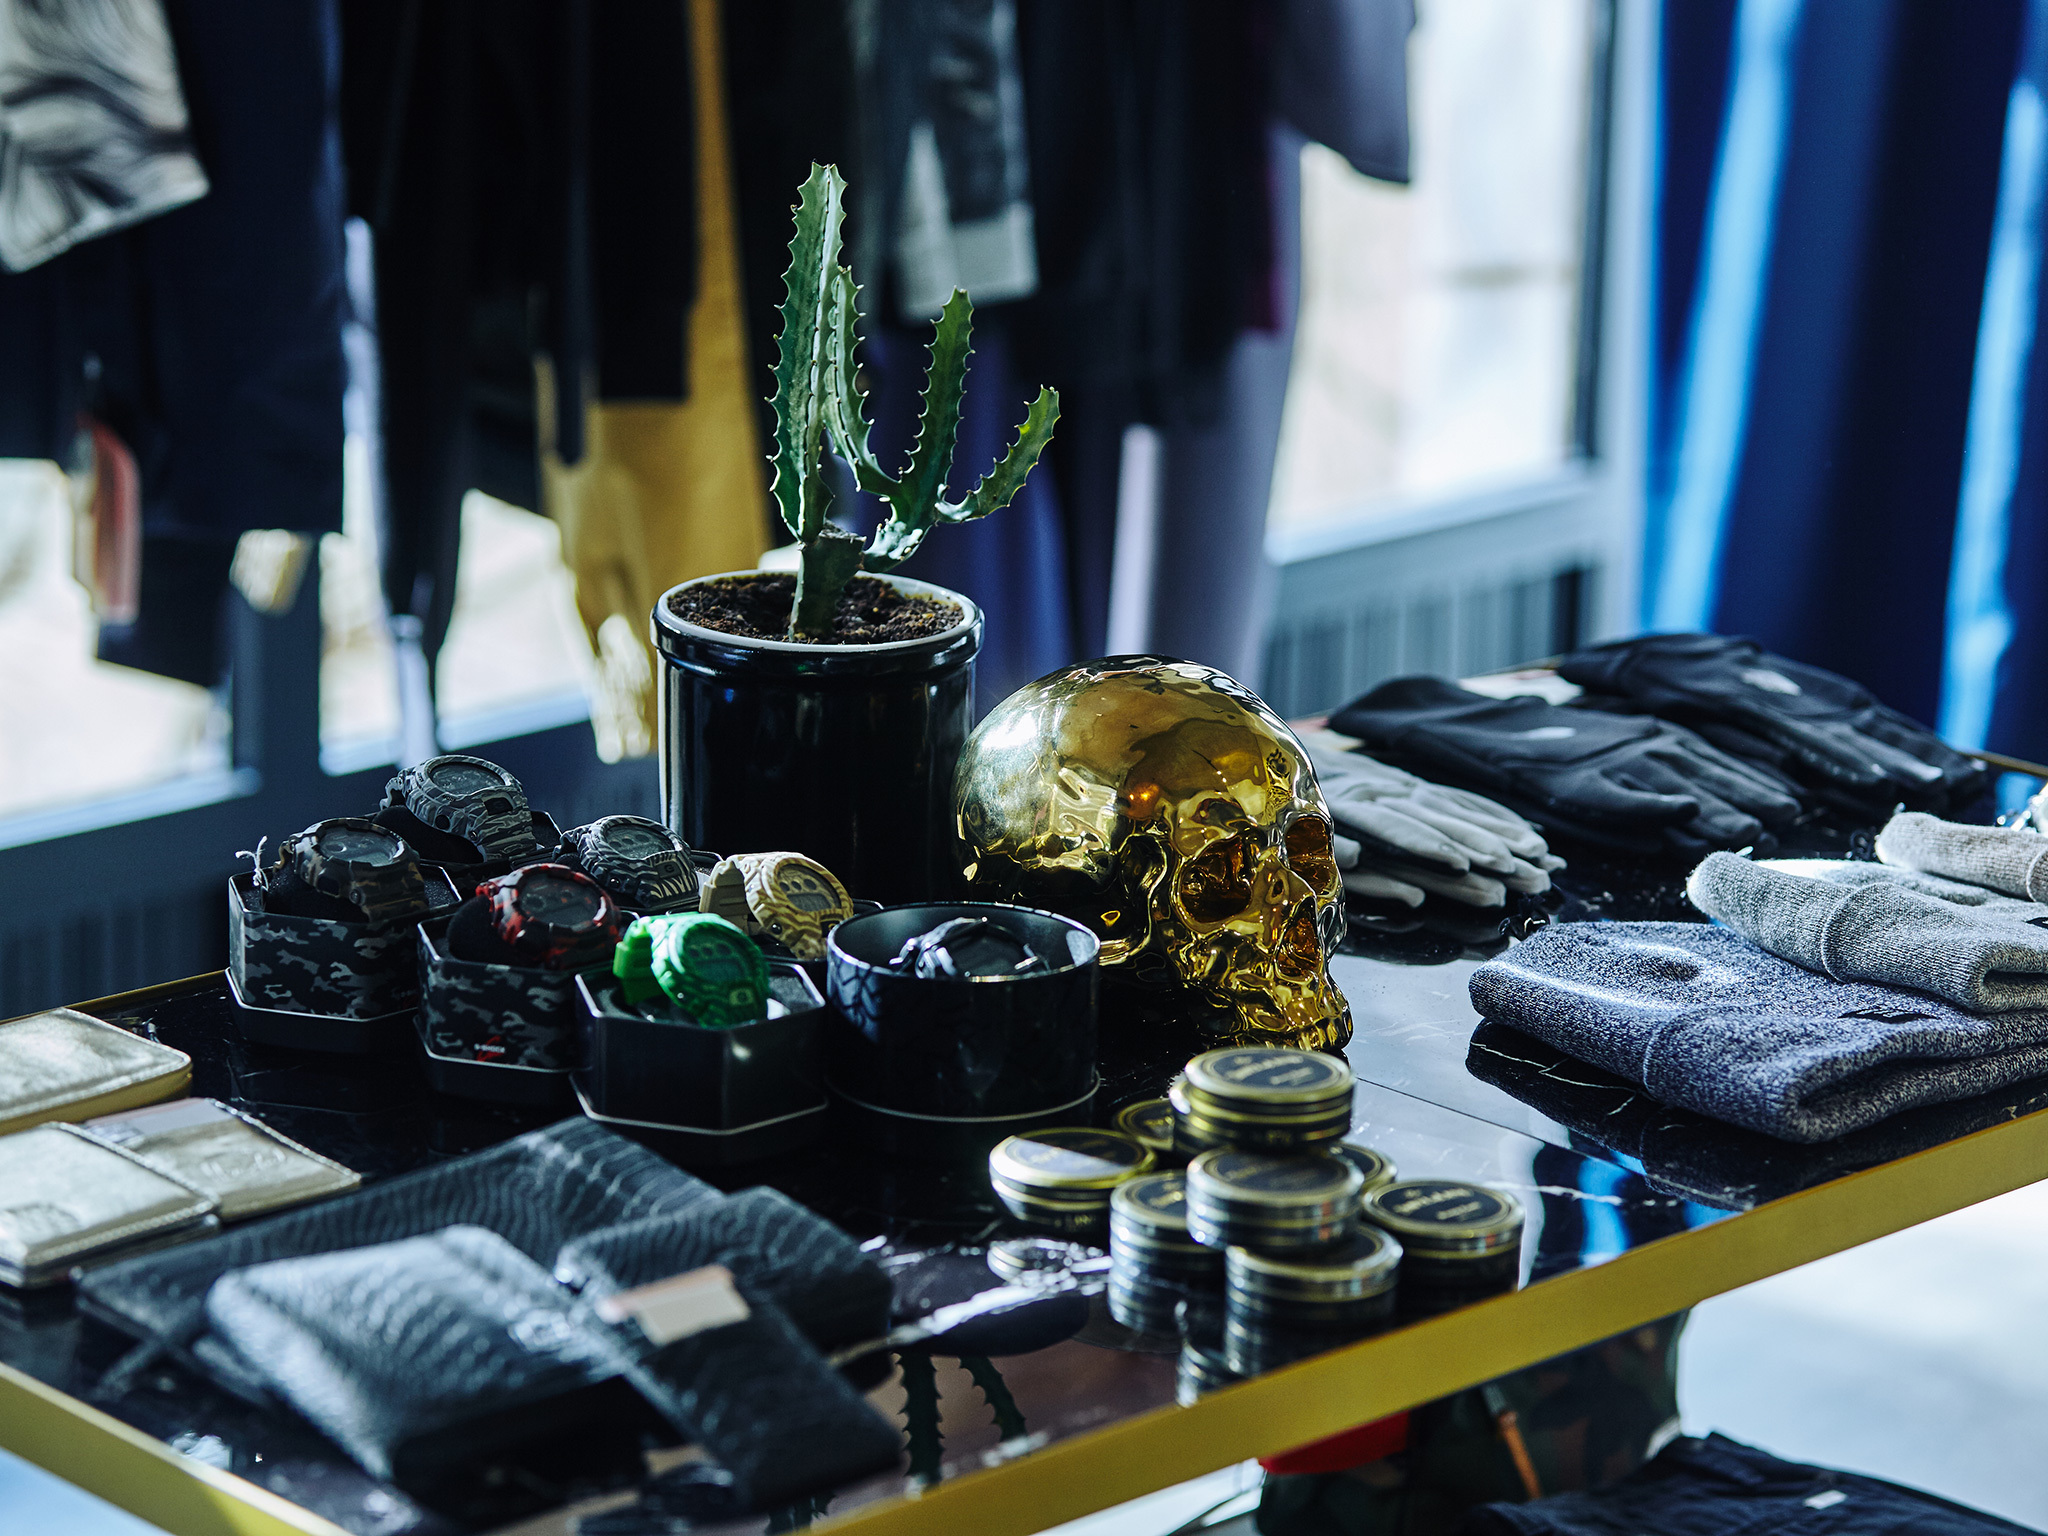 Istanbul's coolest shops